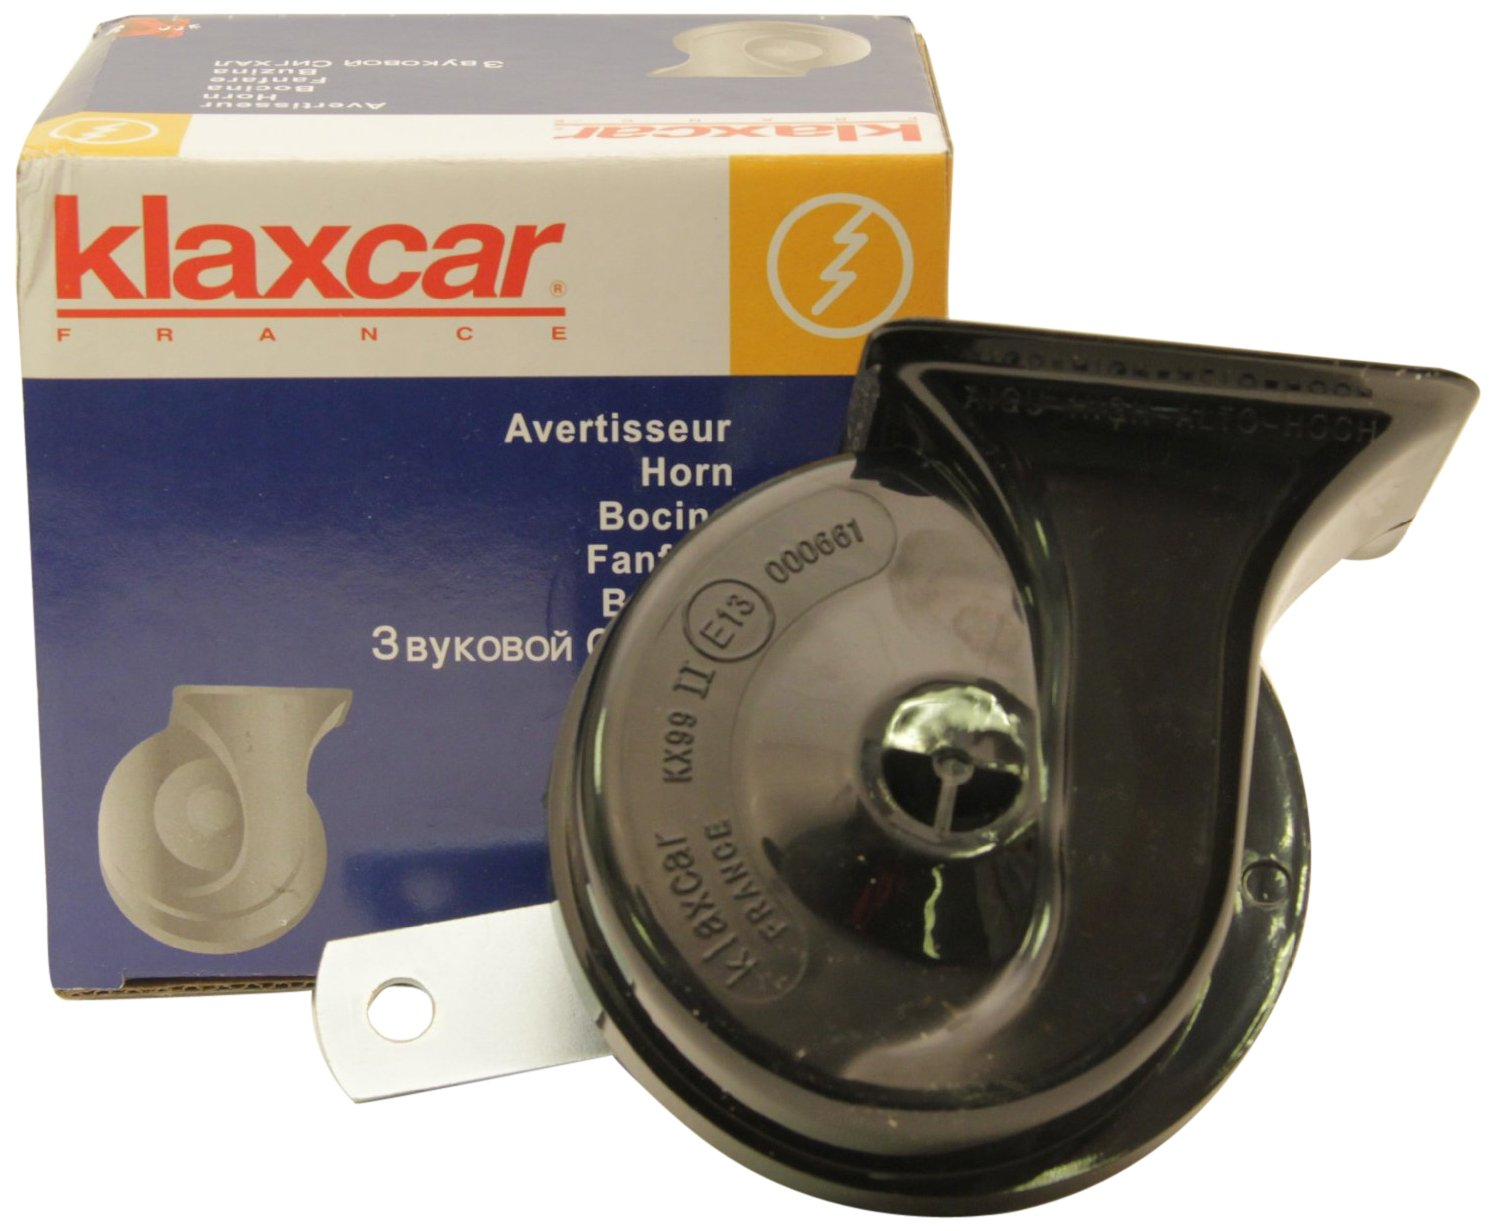 Klaxcar France 81944K - Clacson Black Singolo TR99, 24V, High 2B